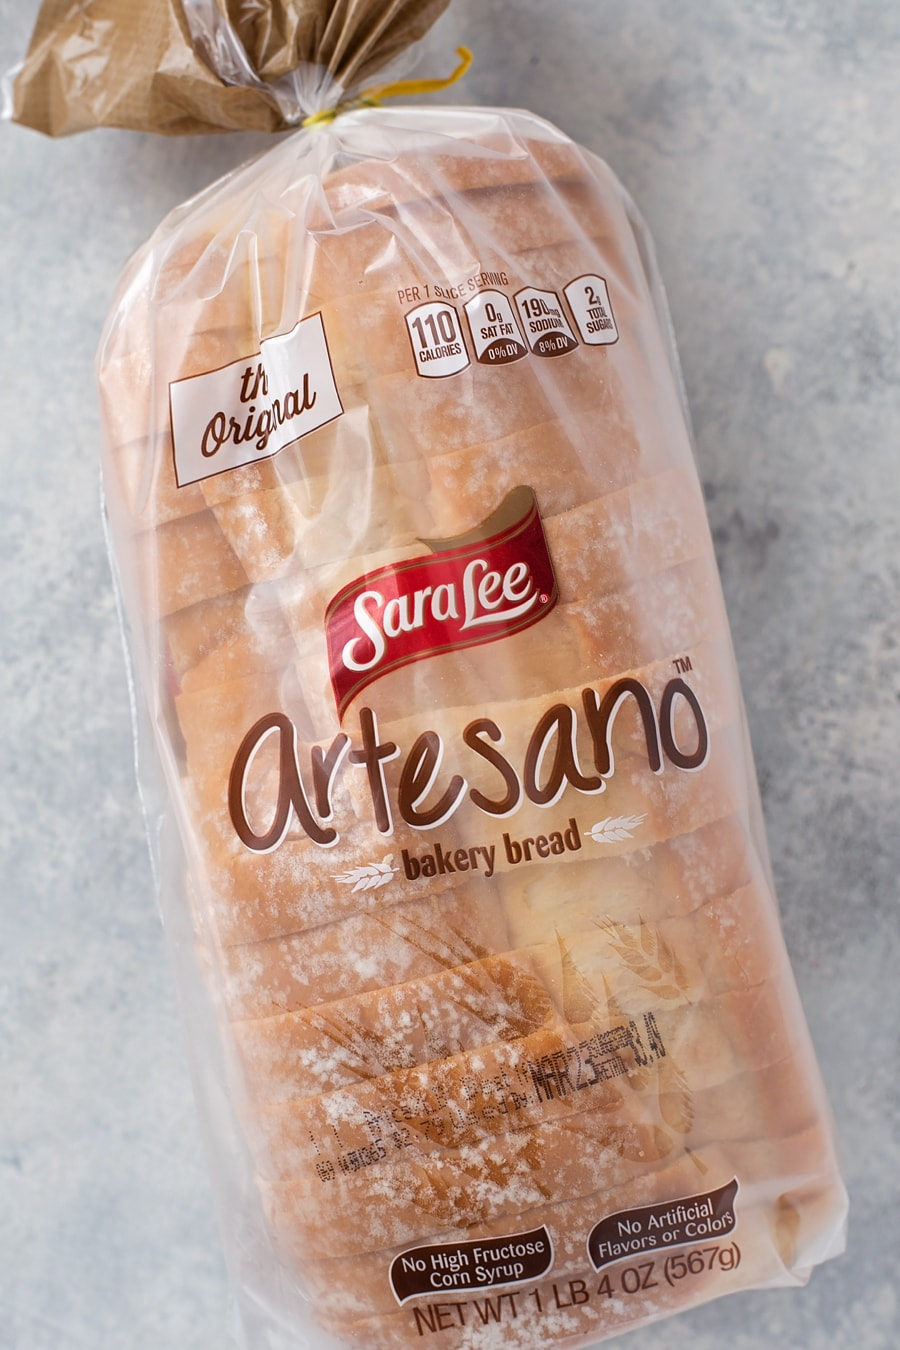 Sara Lee Artesano Baker Bread